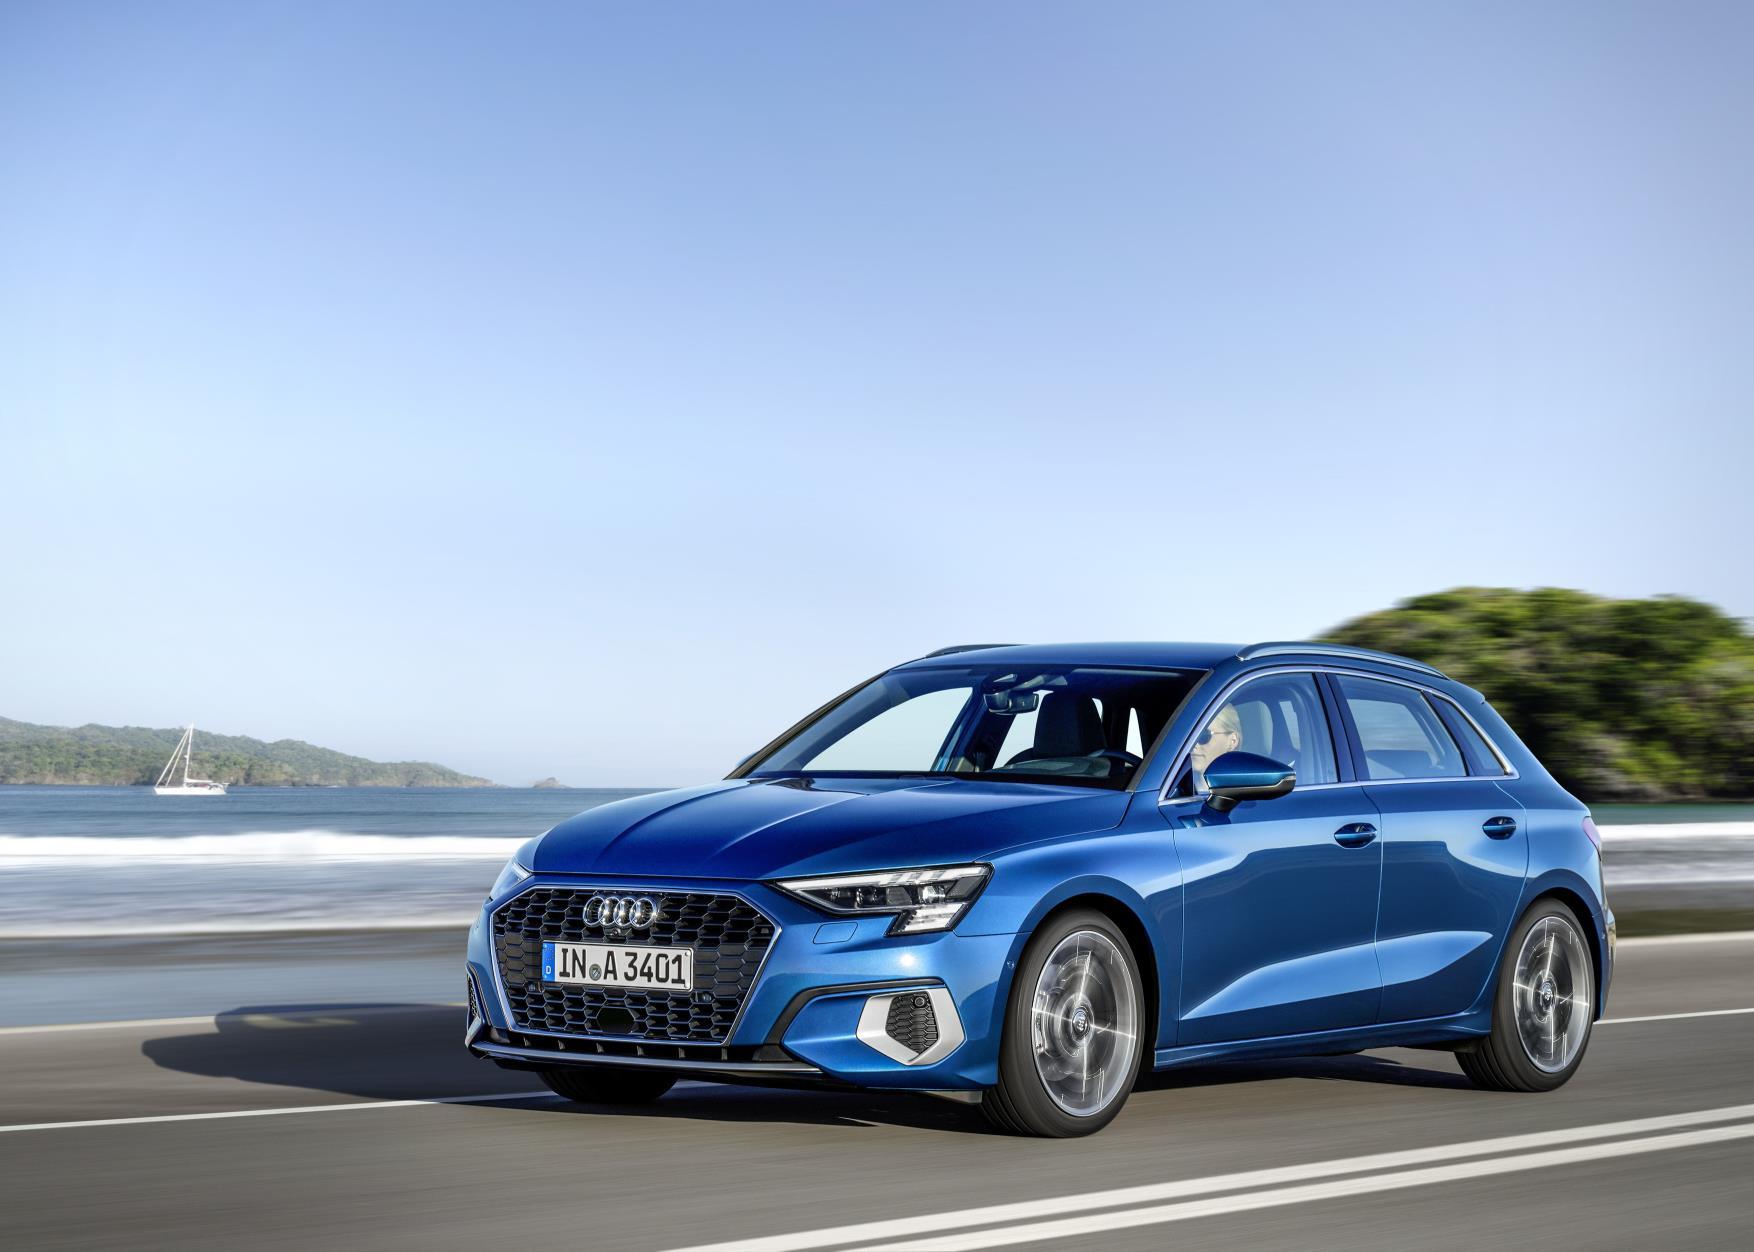 Inicio comercializacion Audi A3